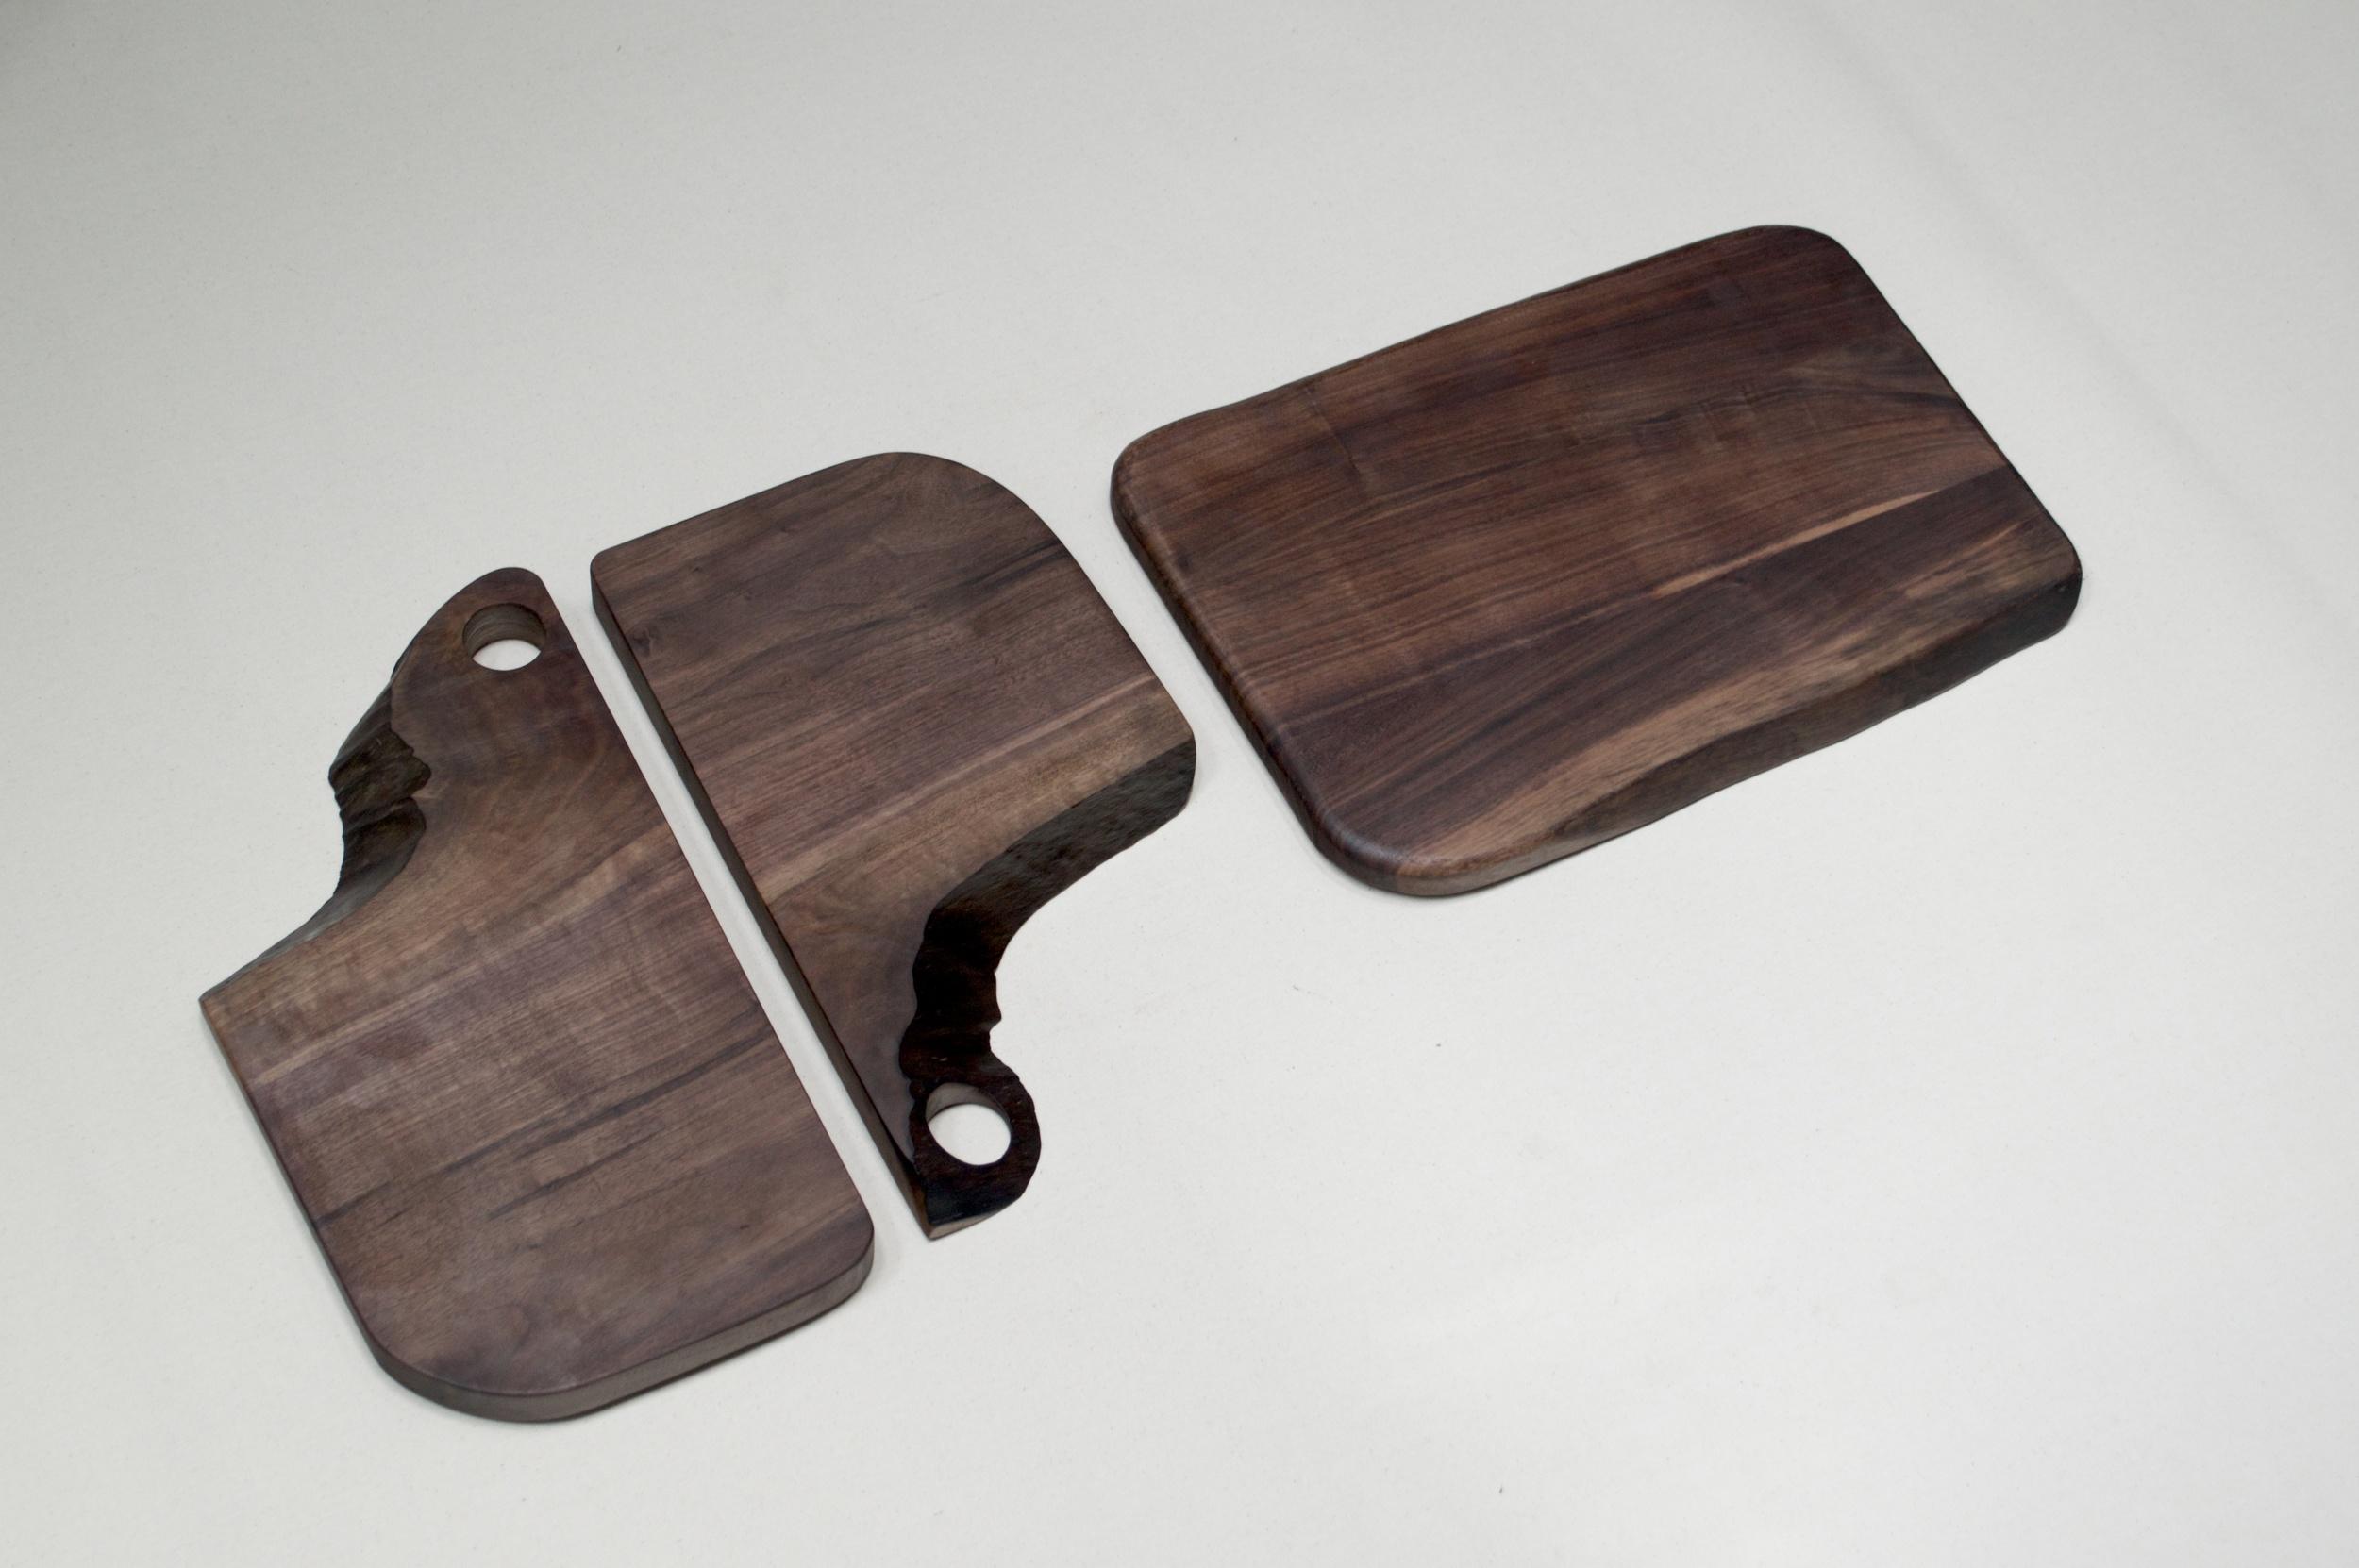 3 serving boards